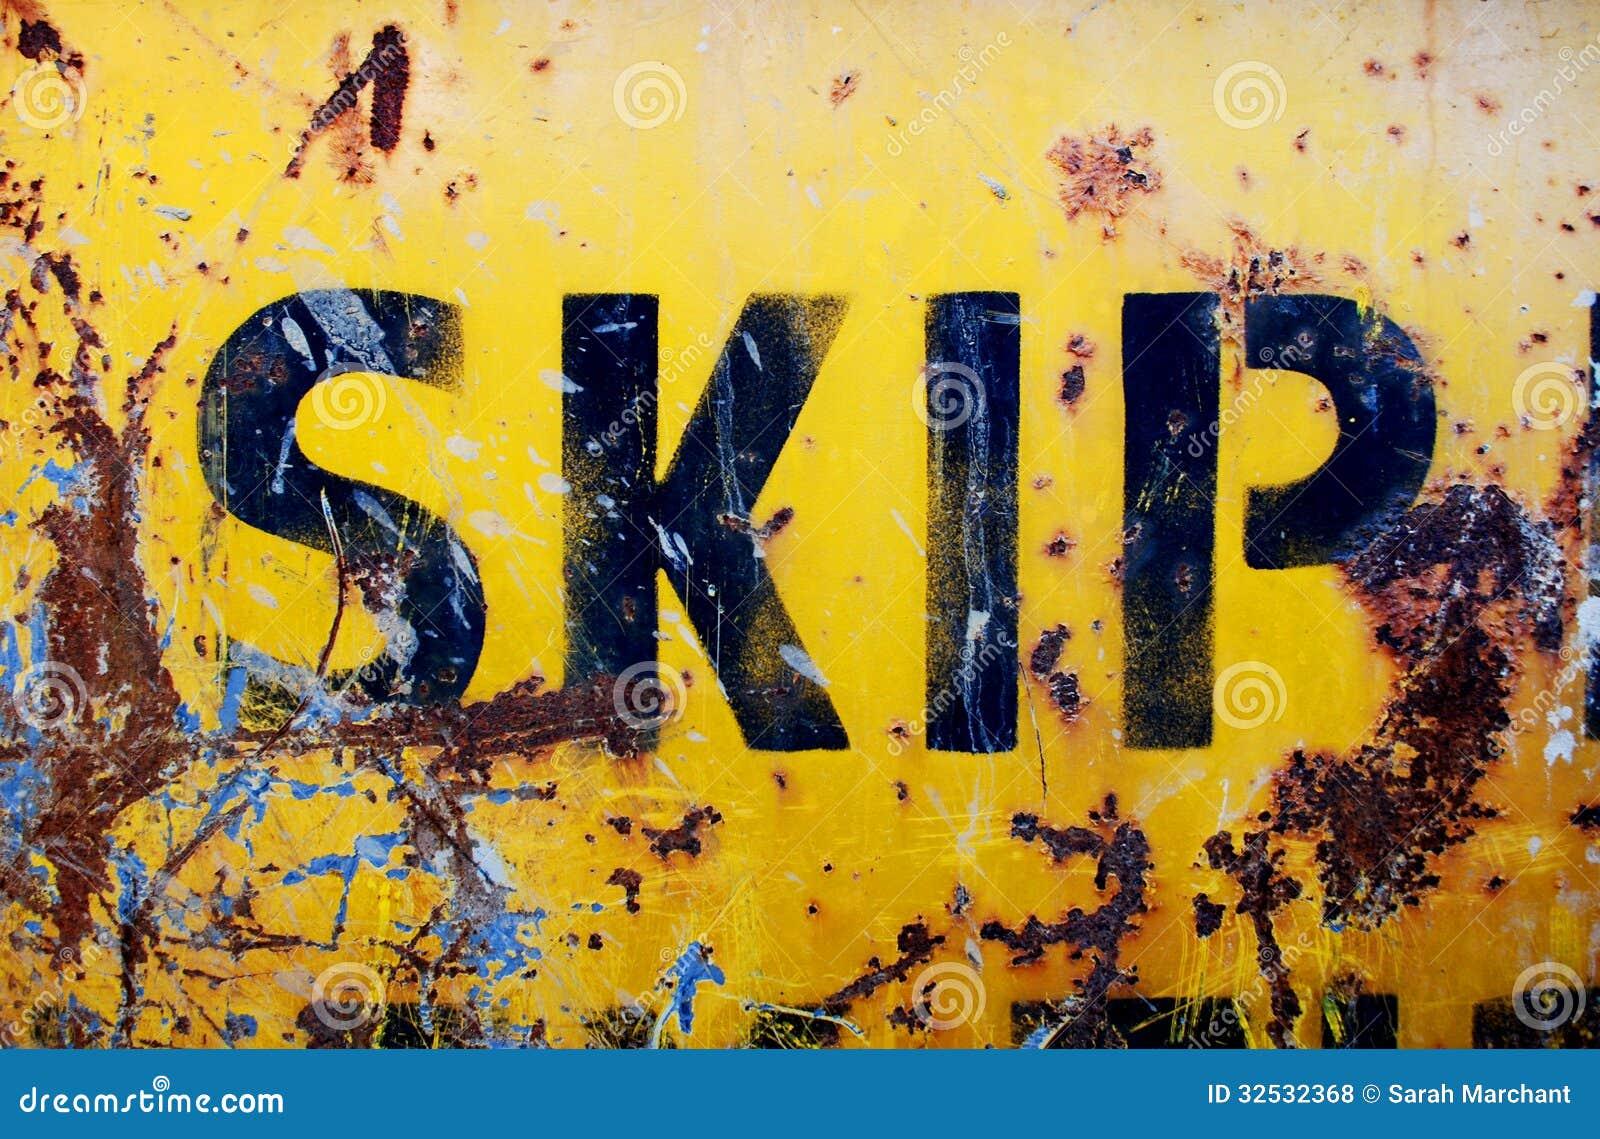 Rusty yellow skip